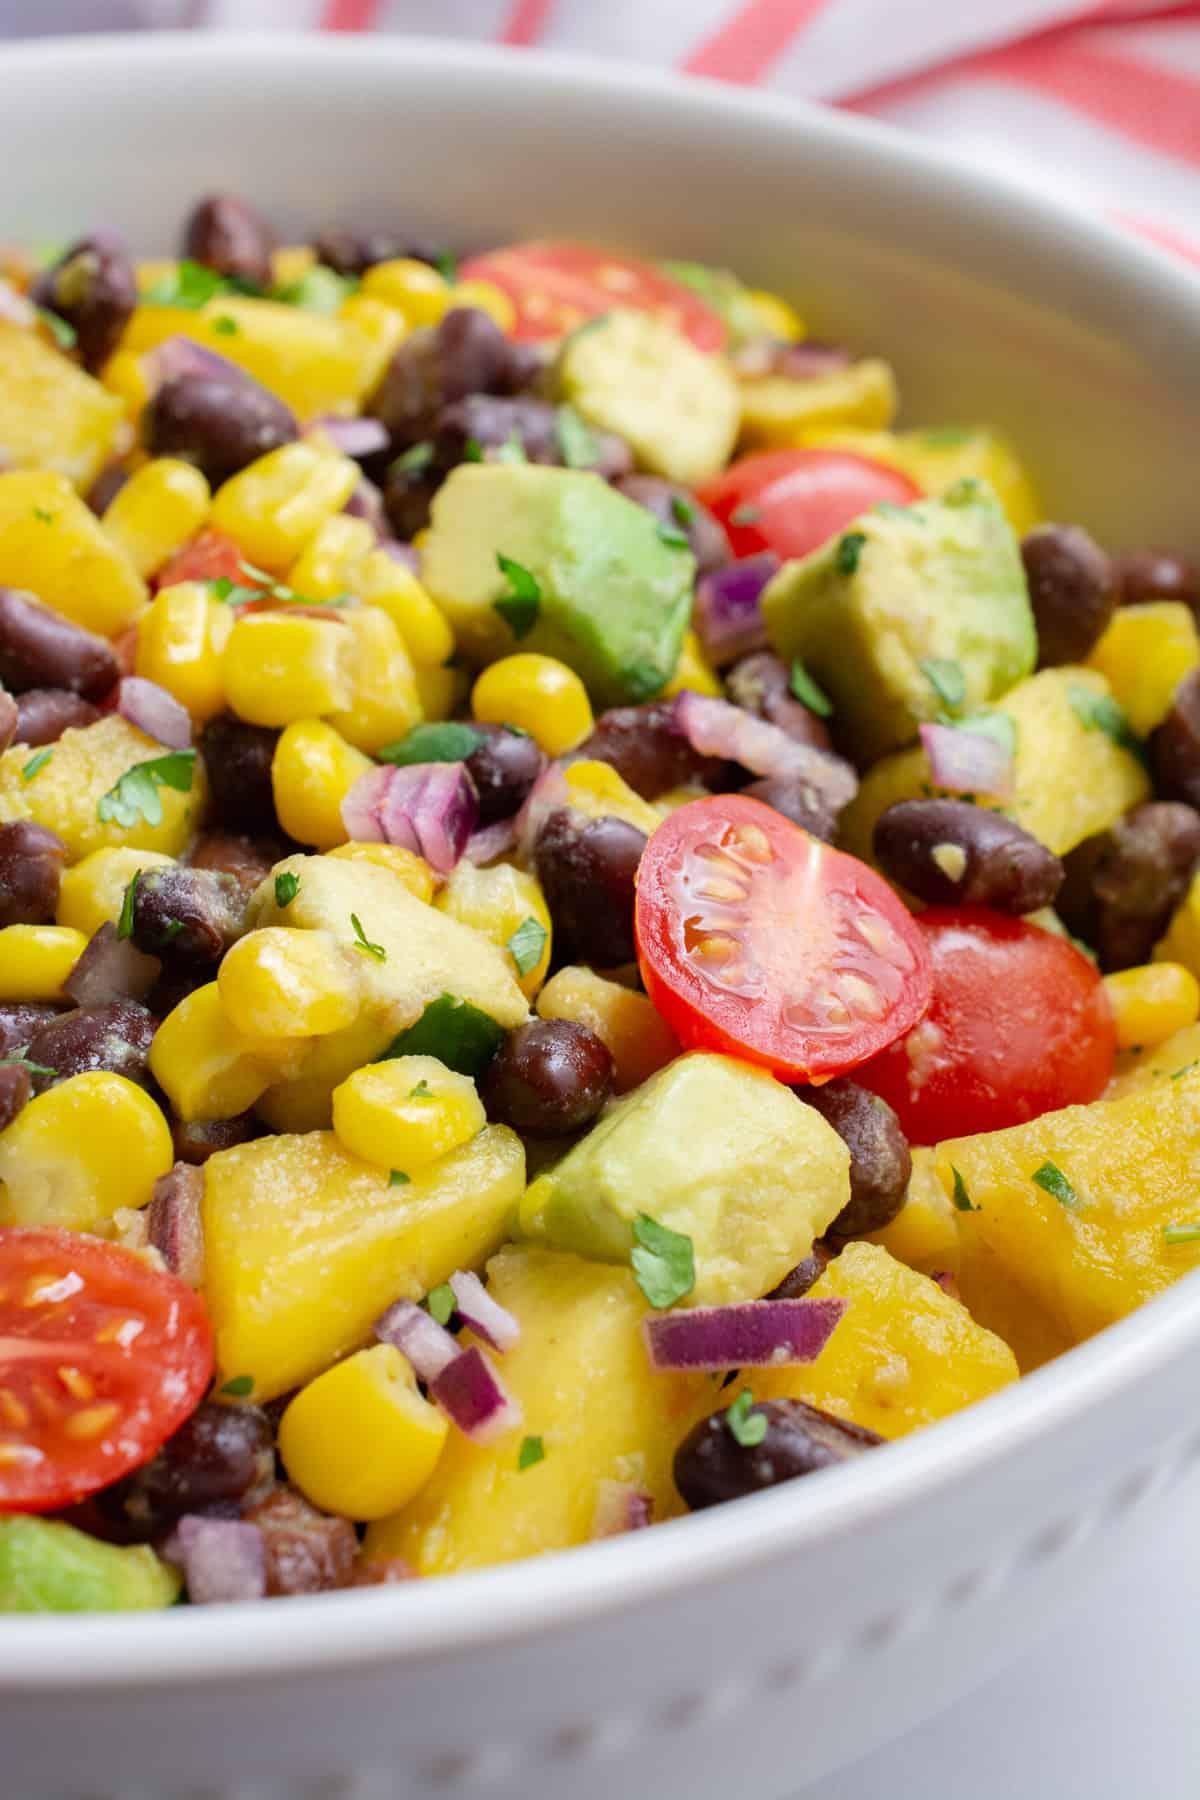 A closeup of a bowl of pineapple black bean salad.